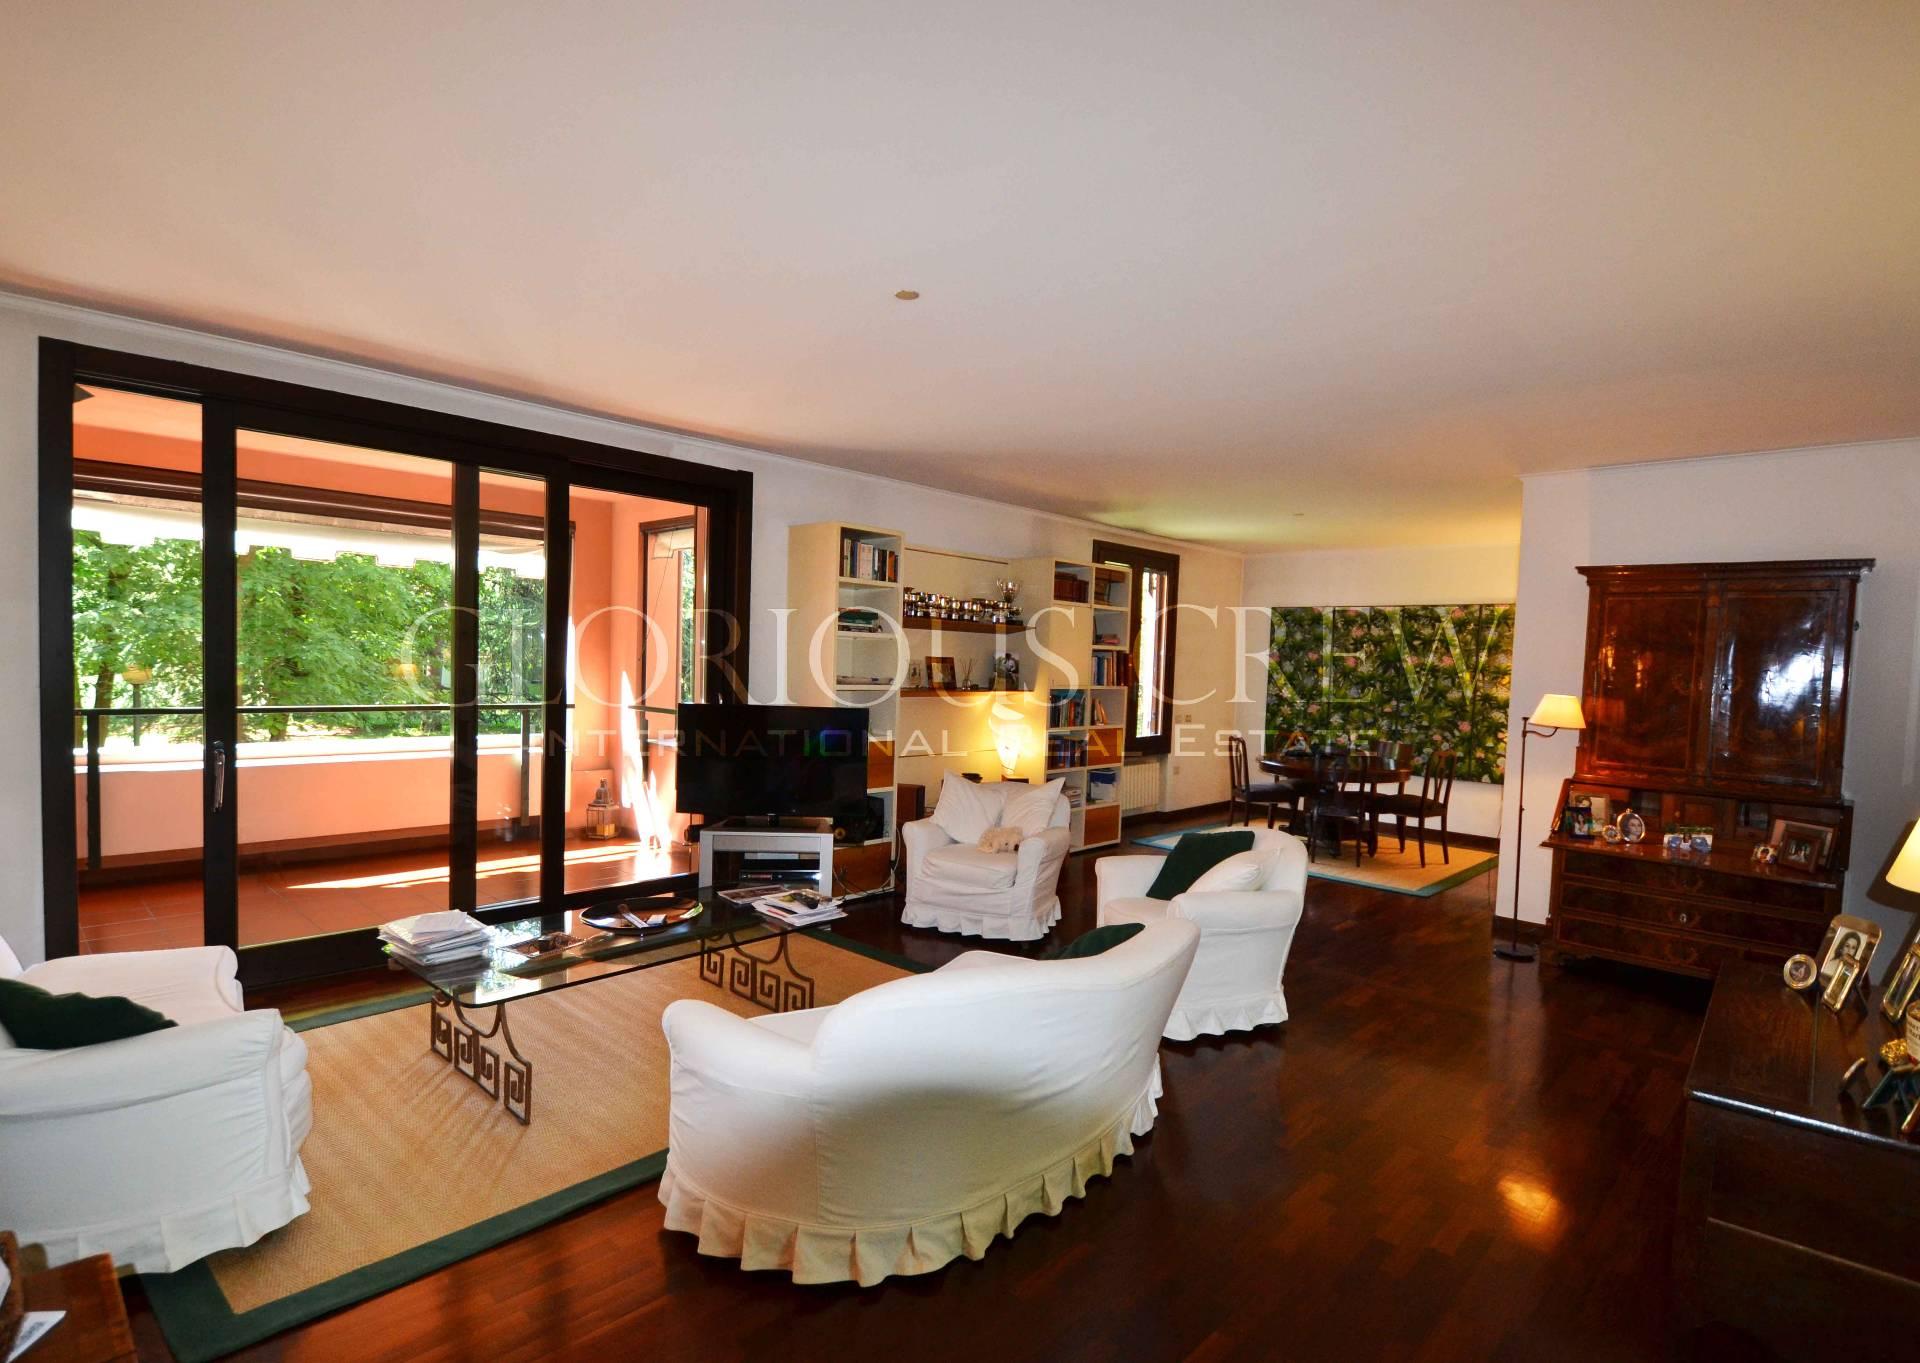 Cusago | Appartamento in Vendita in Via Bareggio  | lacasadimilano.it